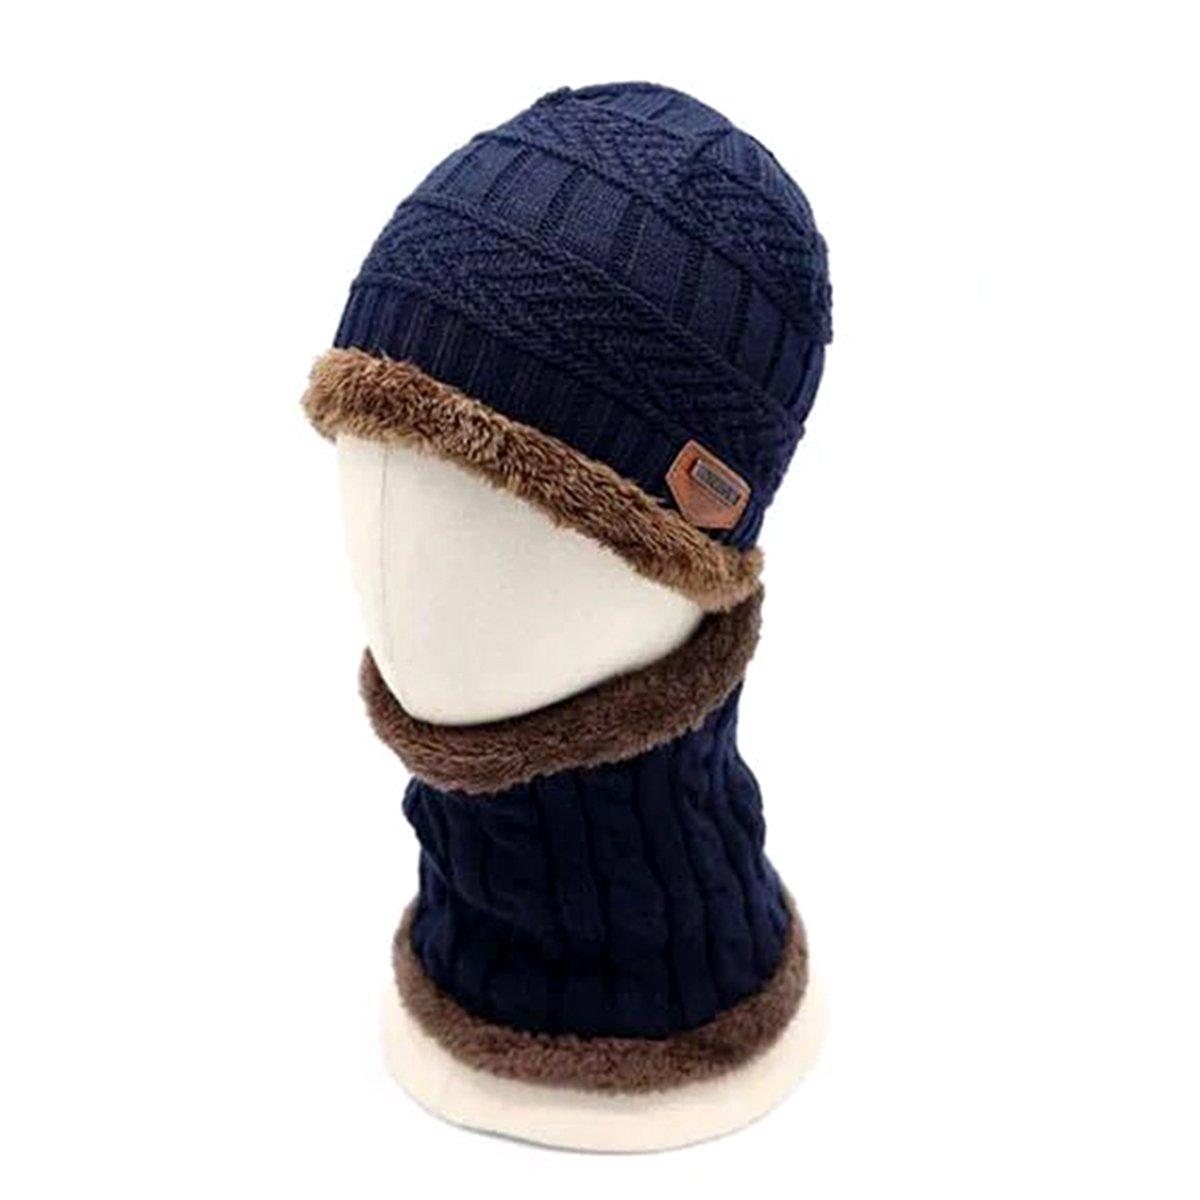 Butterme Winter Baby Girls Boys Fleece Beanie Hat and Scarf Set Warm Crochet Slouch Hat and Neck Warmer Set(Dark grey) ZUMUii ZUMU00006151